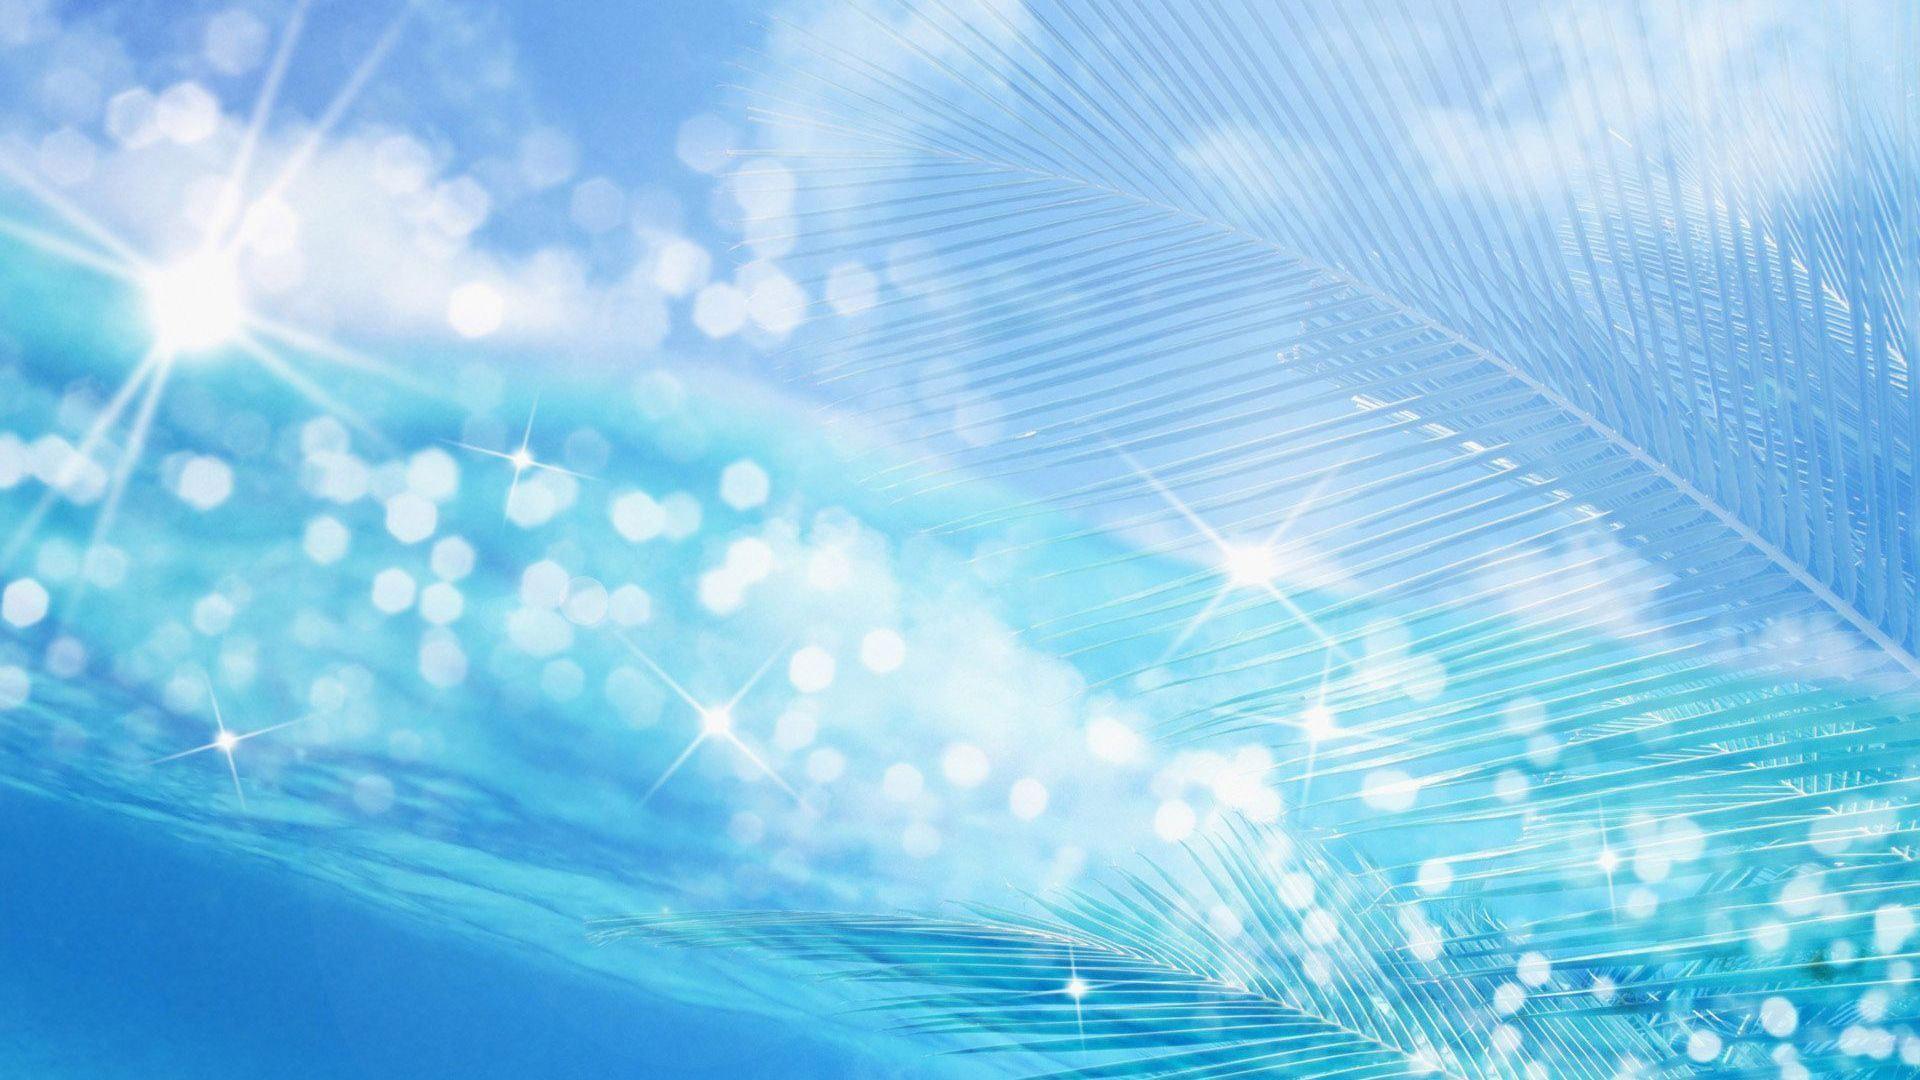 wallpaper.wiki-Light-blue-sparkle-wallpaper-1080p-PIC-